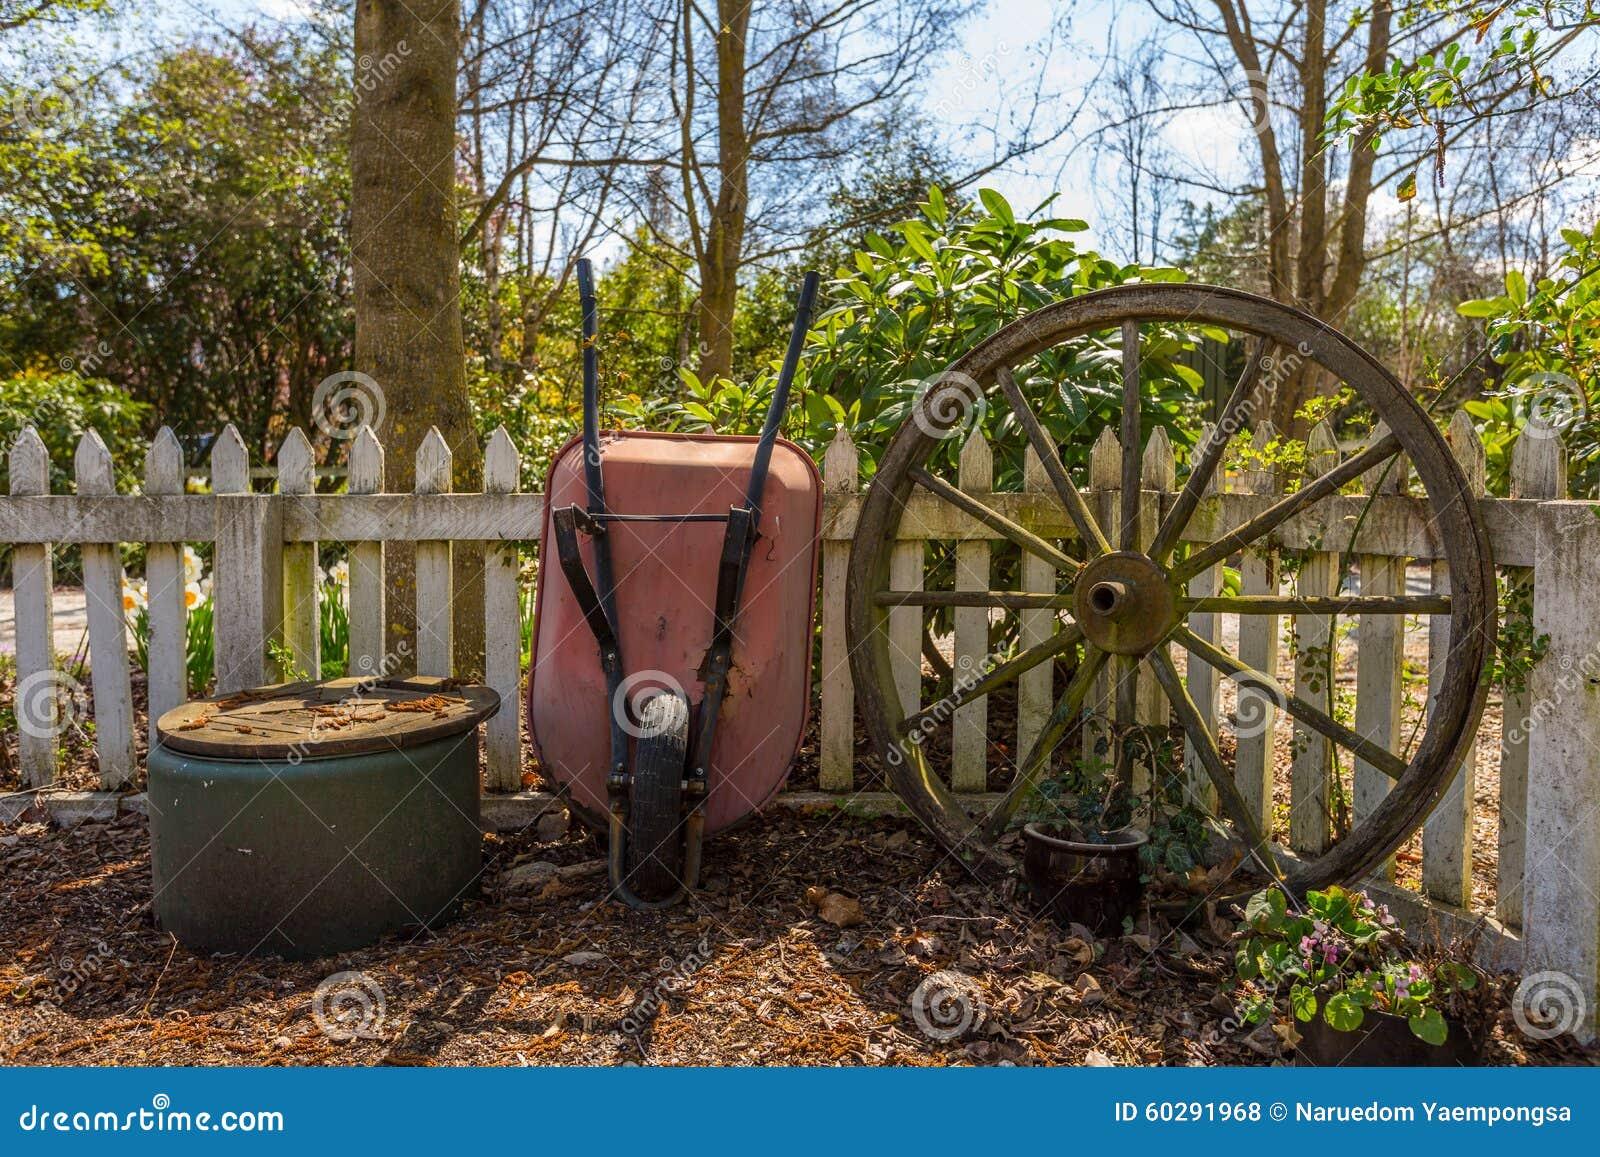 Garden Wheelbarrow And And Old Bullock Cart Wheel Stock Photo ...